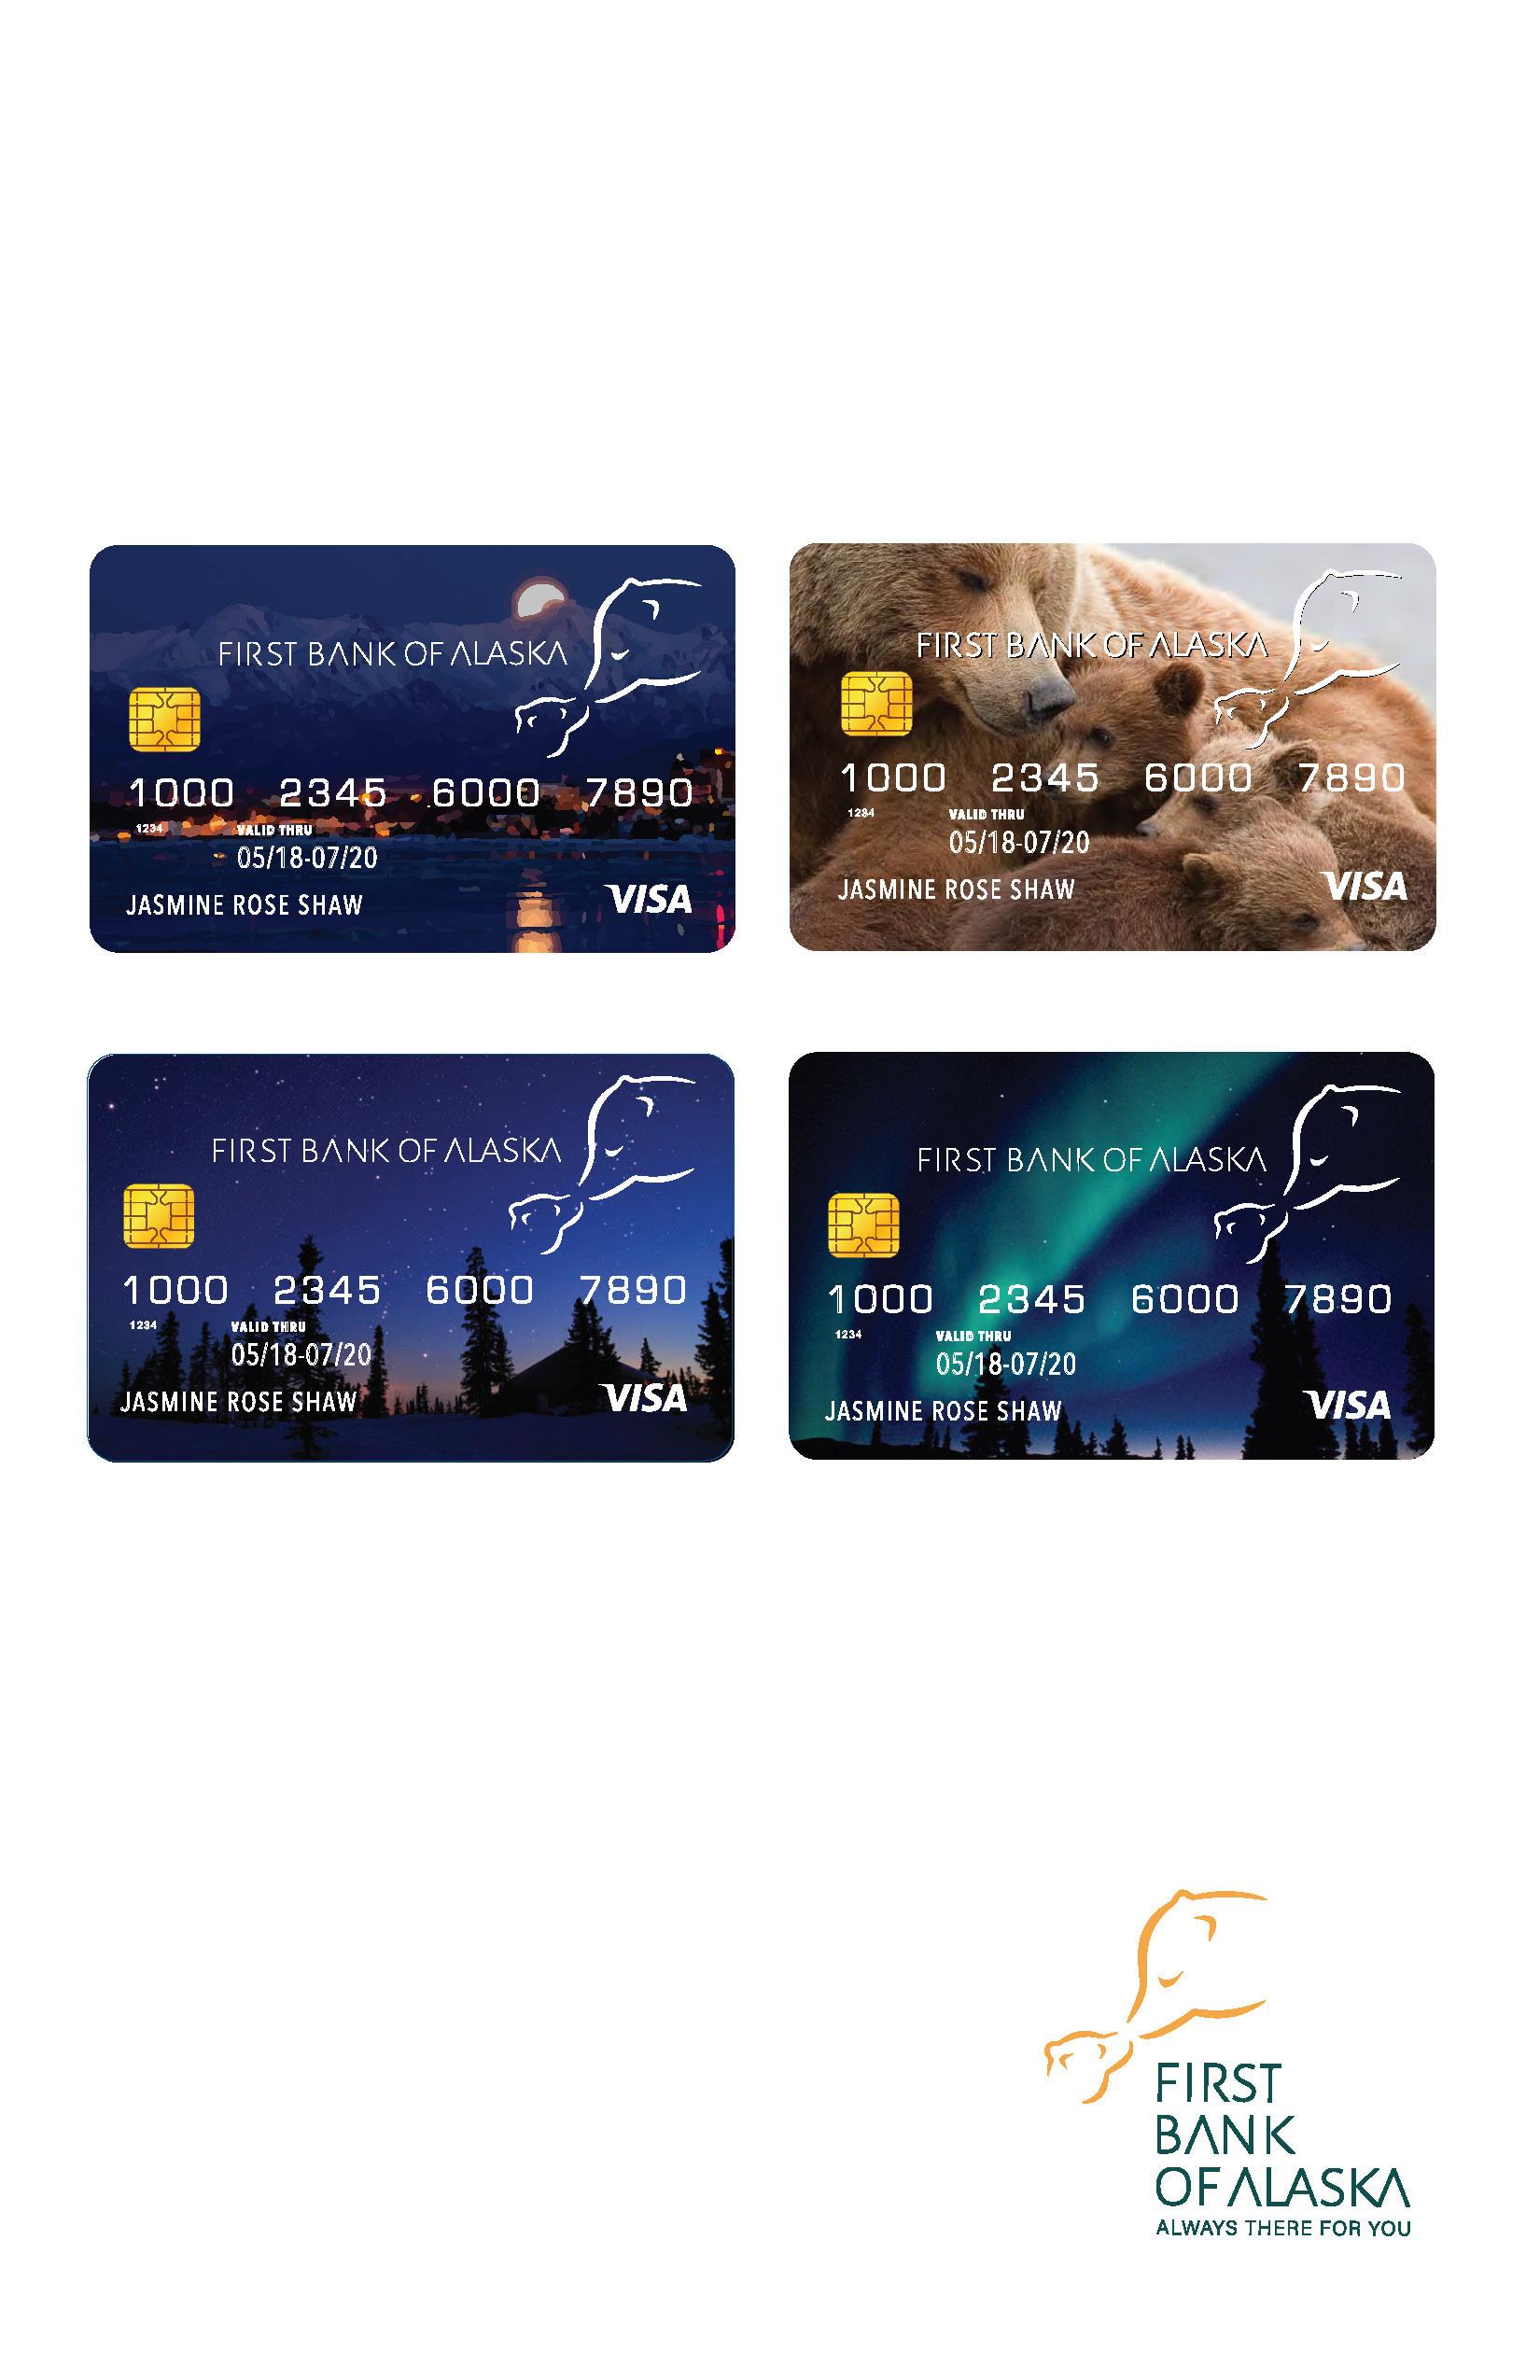 First Bank of Alaska Credit Cards